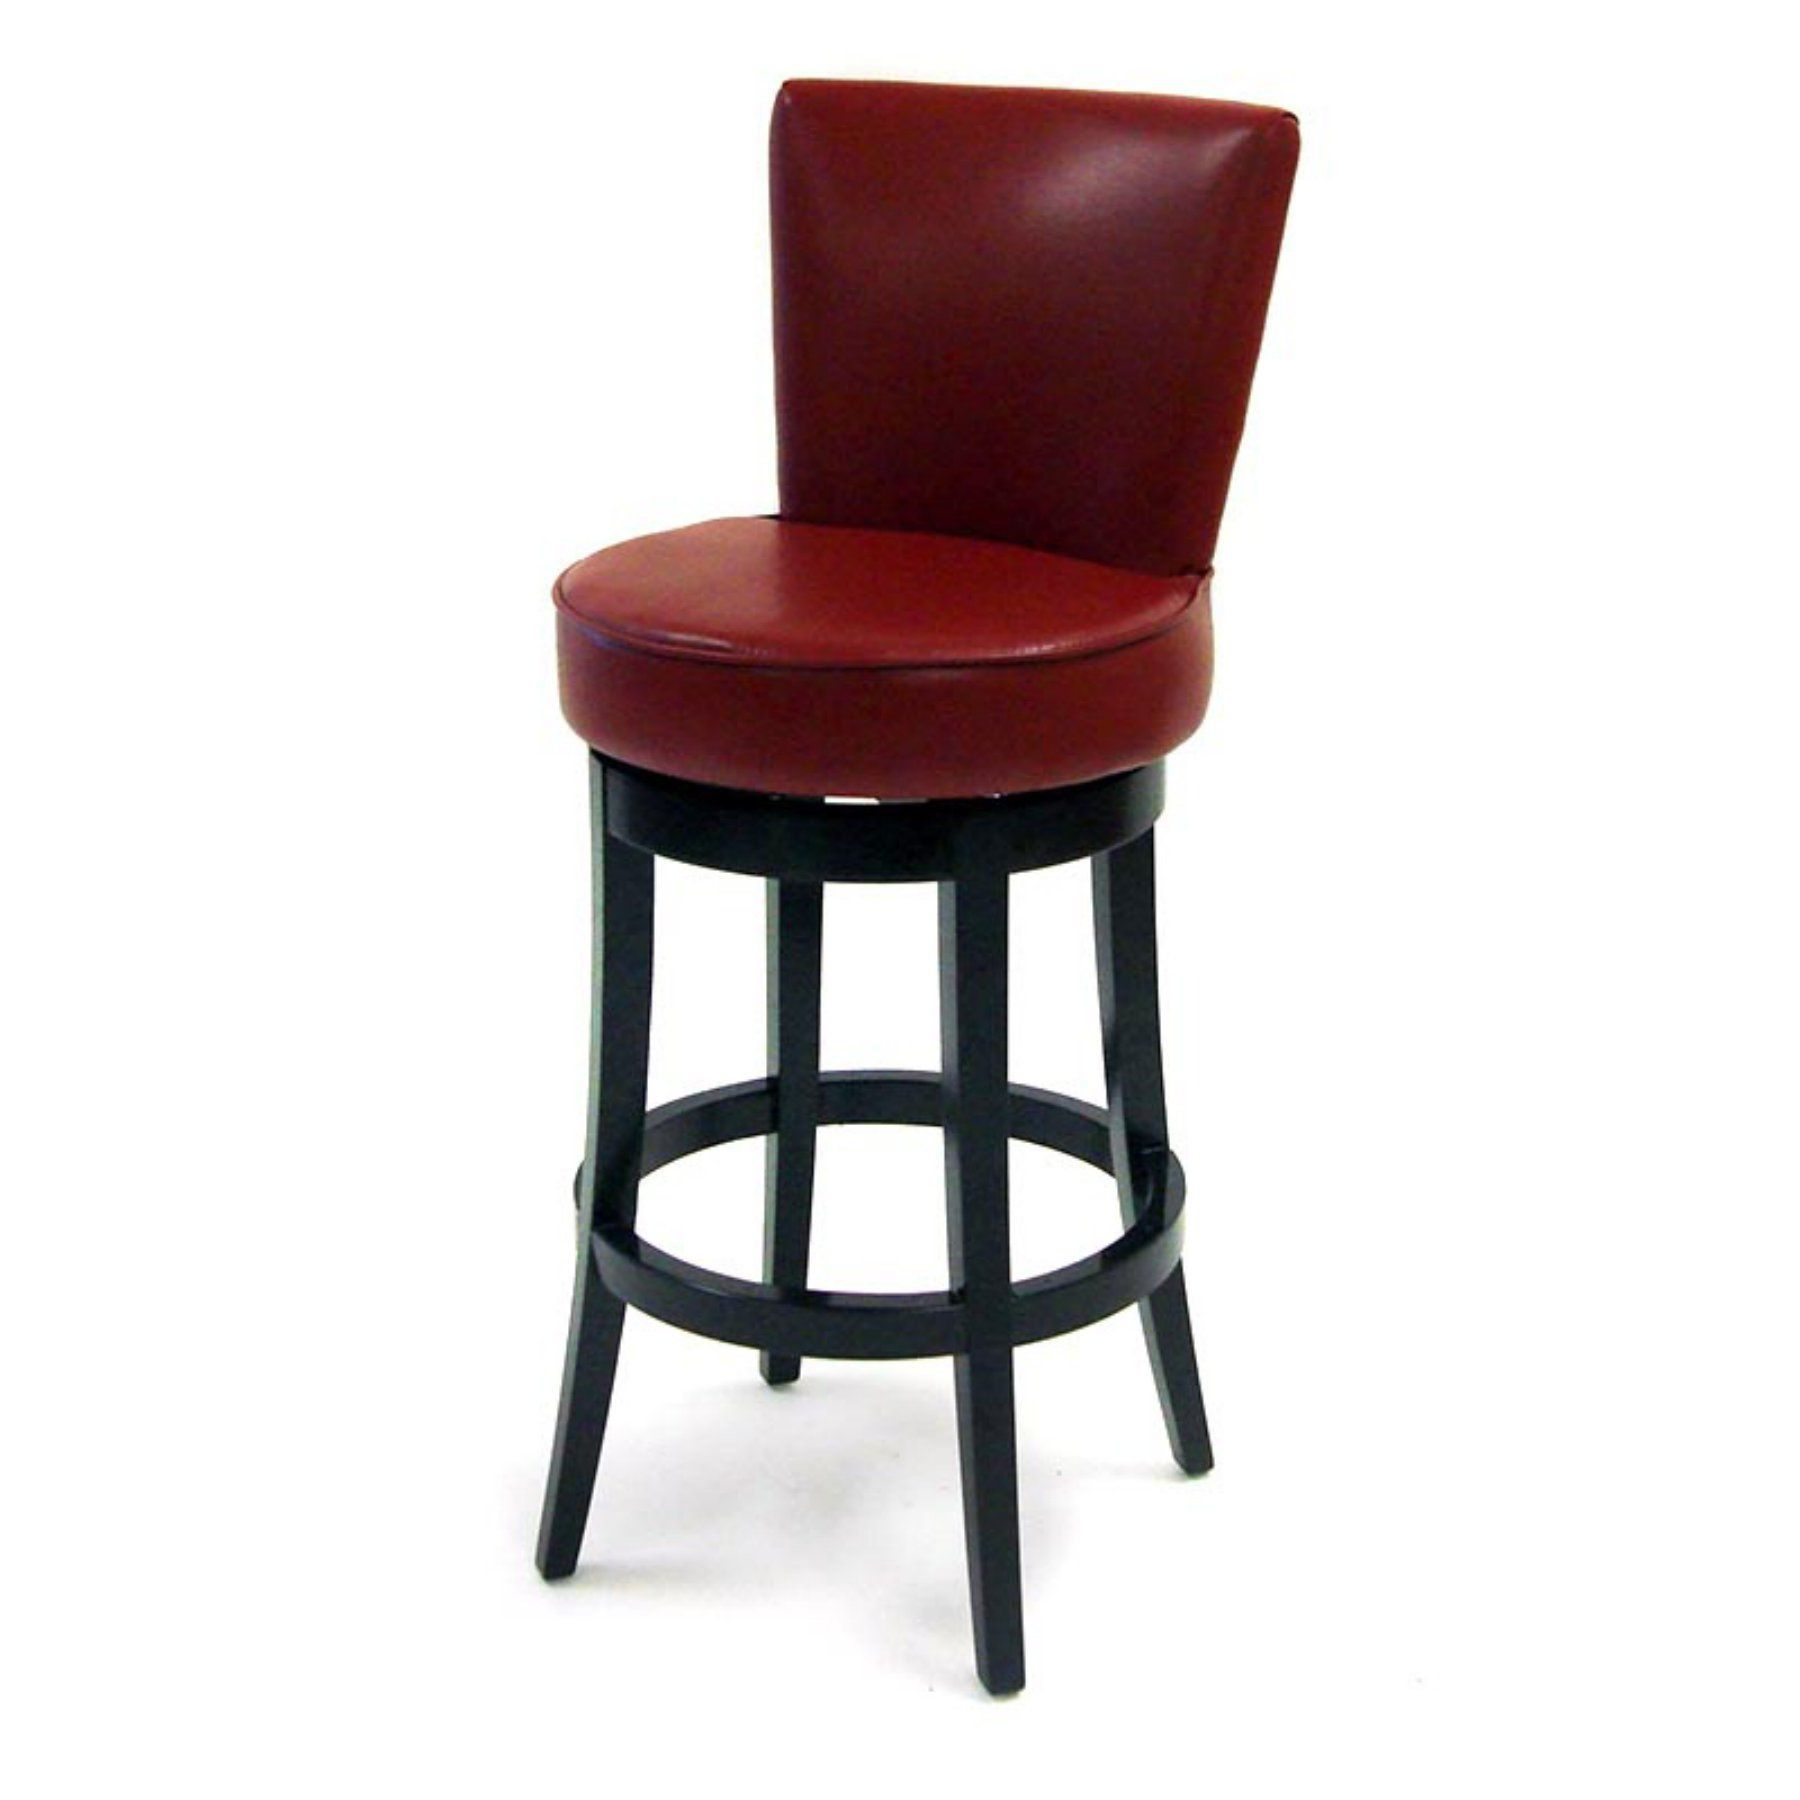 Armen Living Boston Leather Swivel Bar Stool 30 In Red Lc4044bare30 Bar Stools Red Bar Stools Leather Swivel Bar Stools